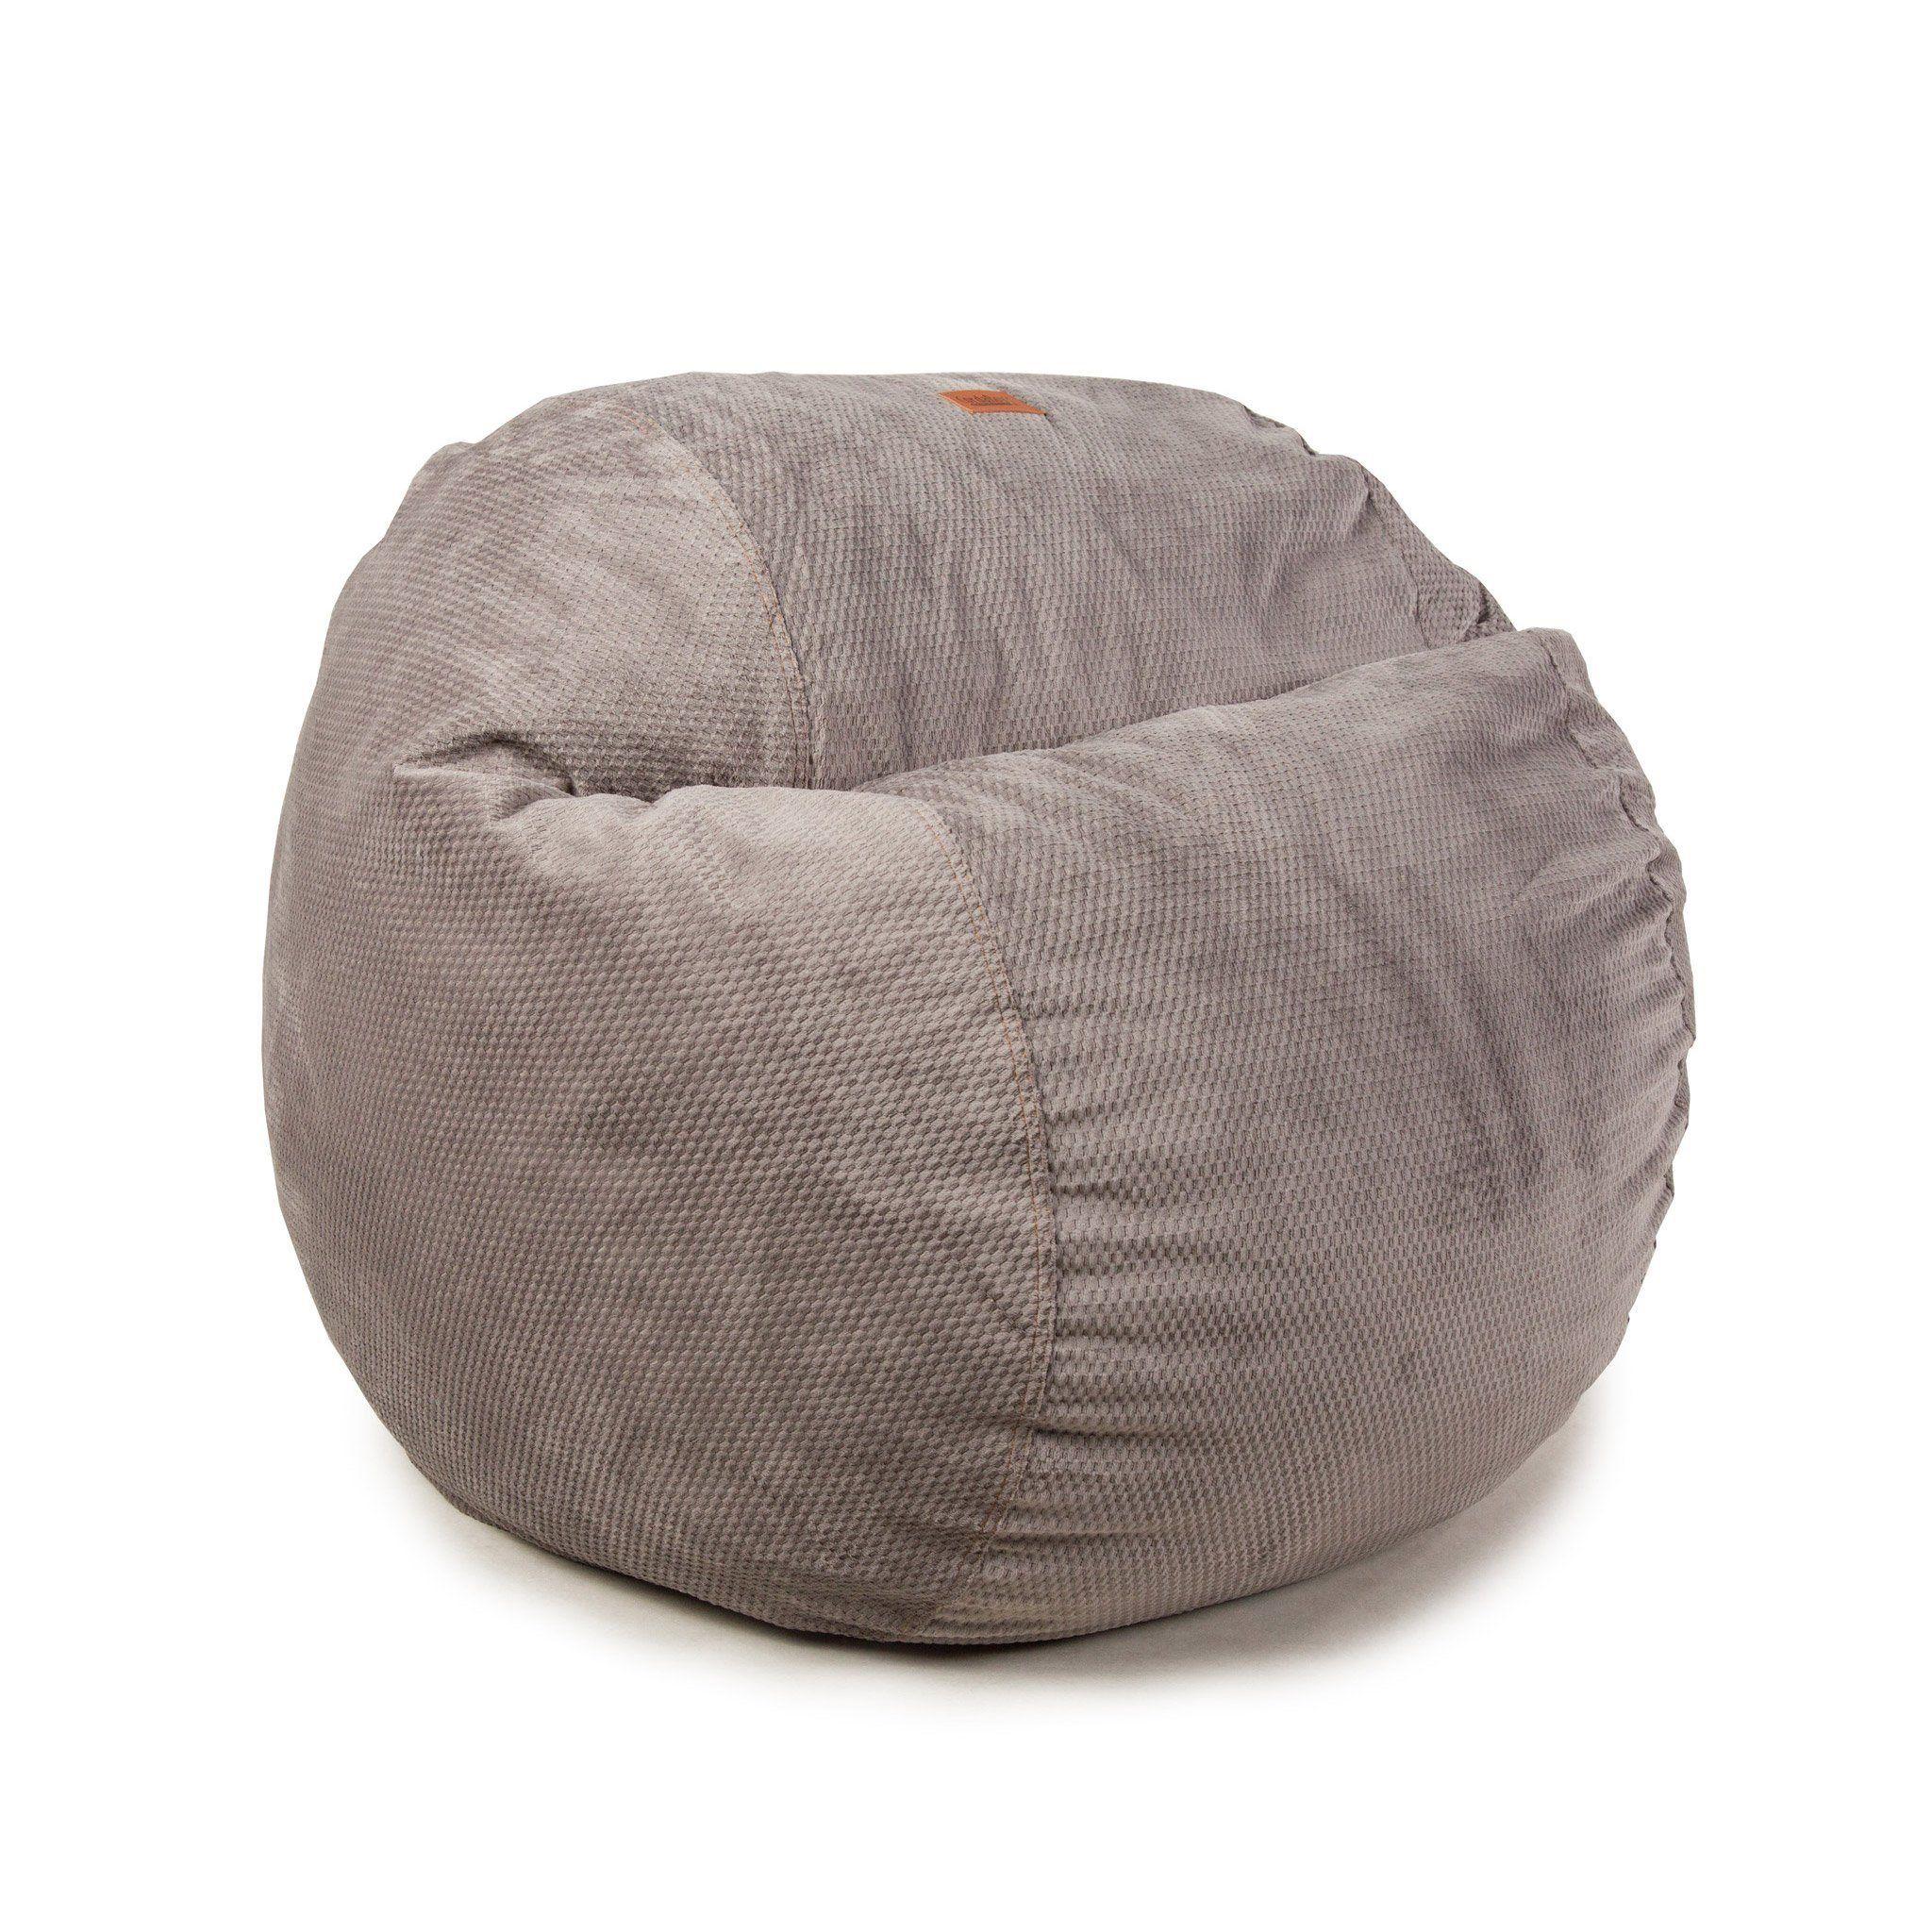 Tappeti Grandi Da Esterno swivel floor chair amazon: tobbi fabric folded floor